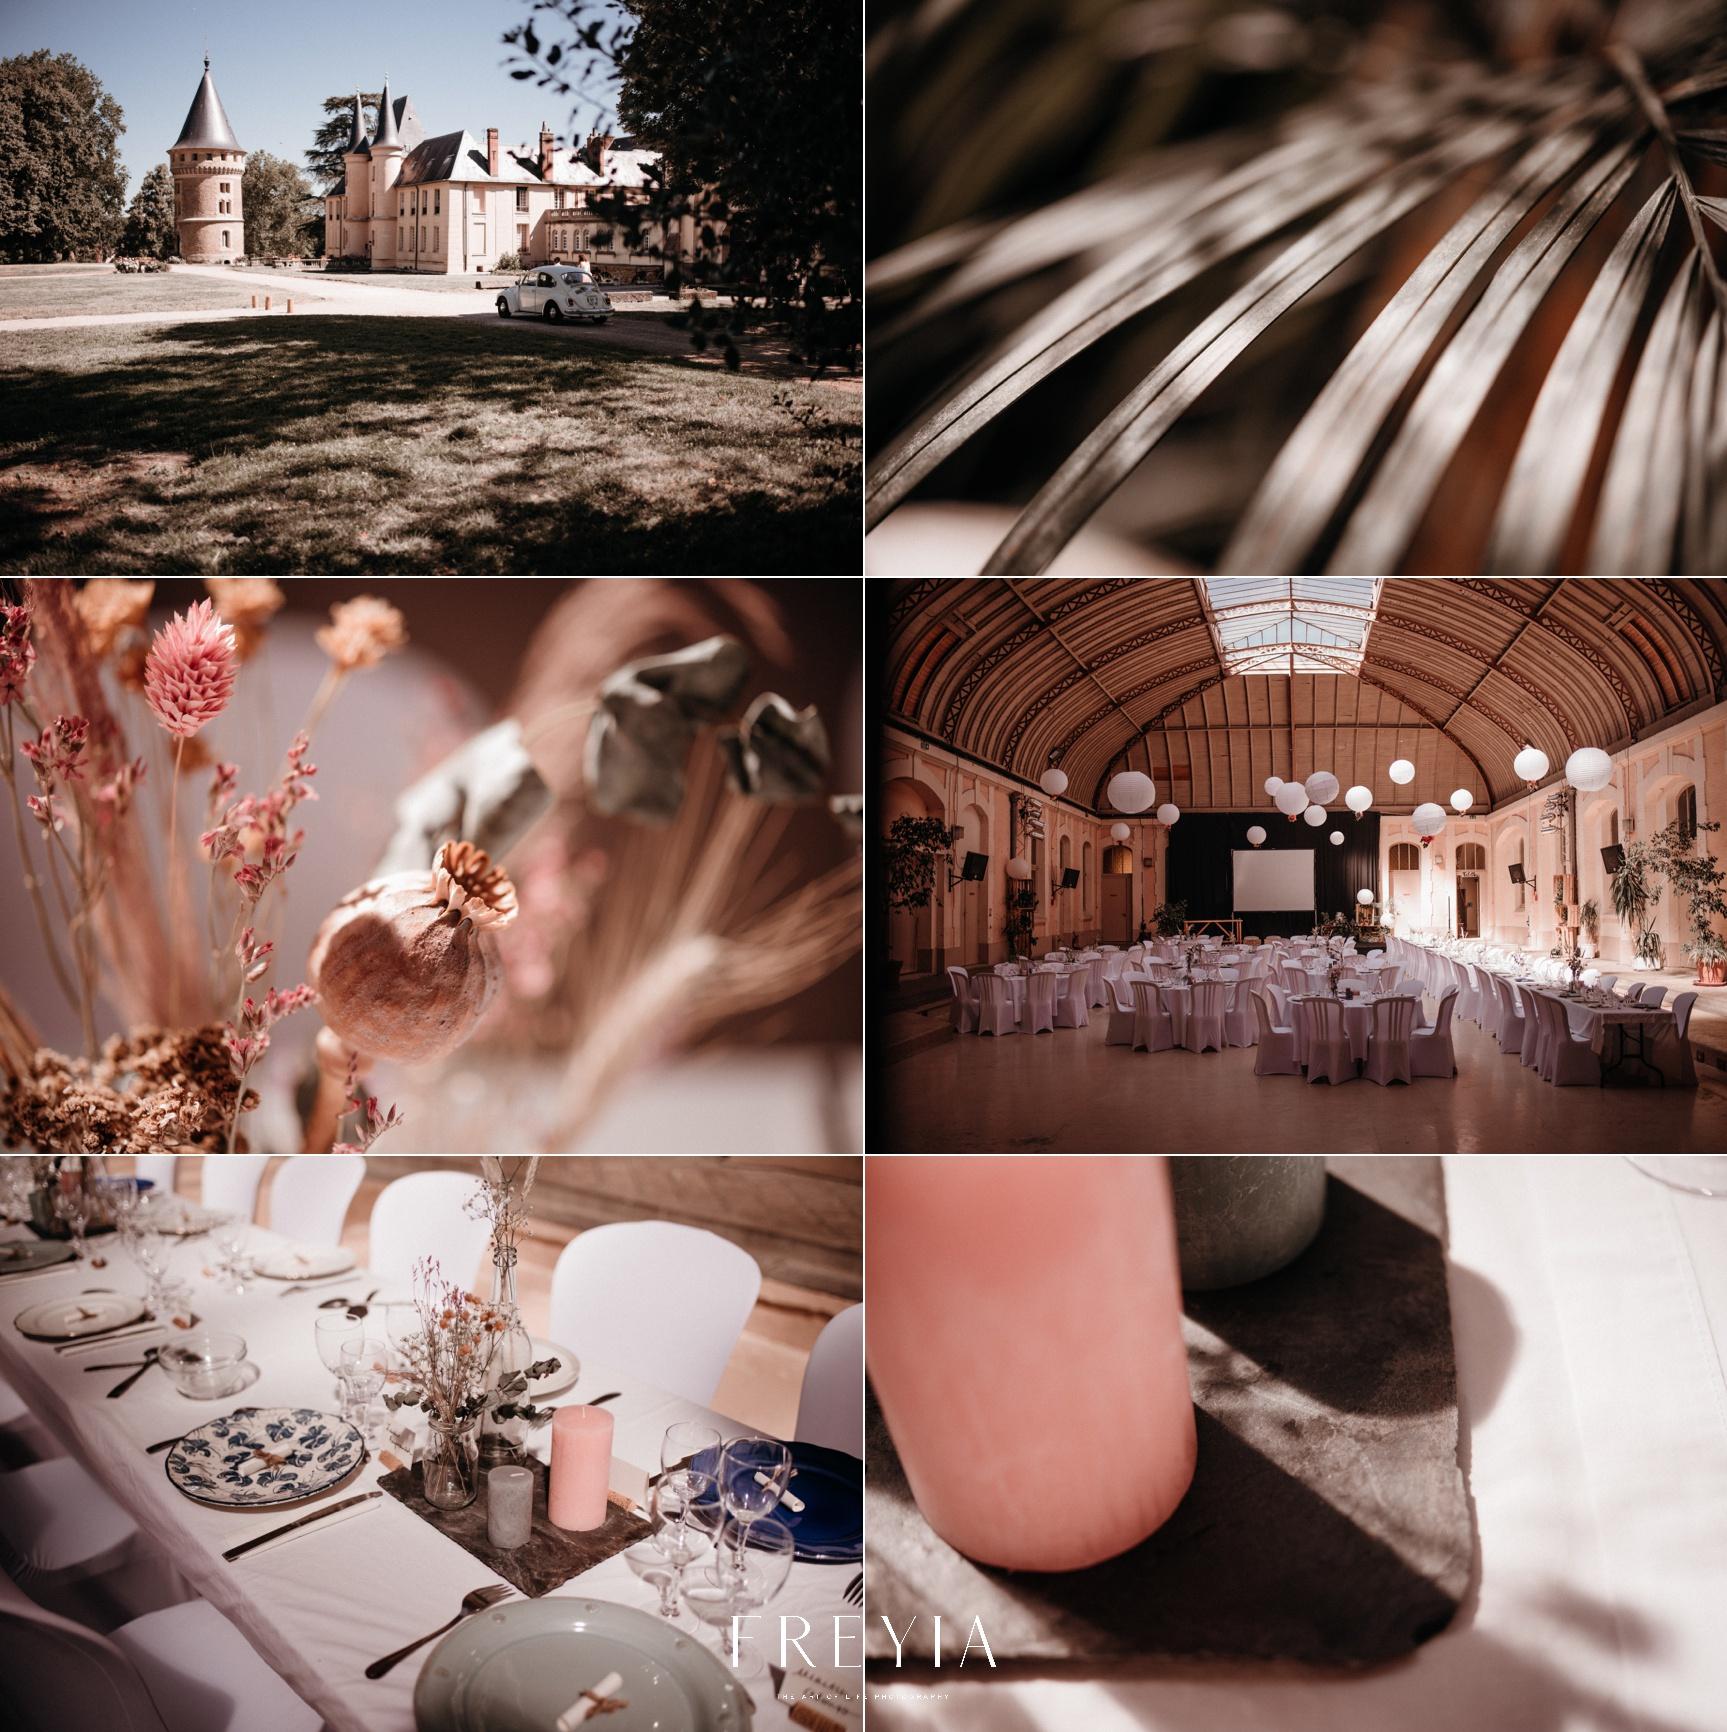 R + T |  mariage reportage alternatif moody intime minimaliste vintage naturel boho boheme |  PHOTOGRAPHE mariage PARIS france destination  | FREYIA photography_-1.jpg